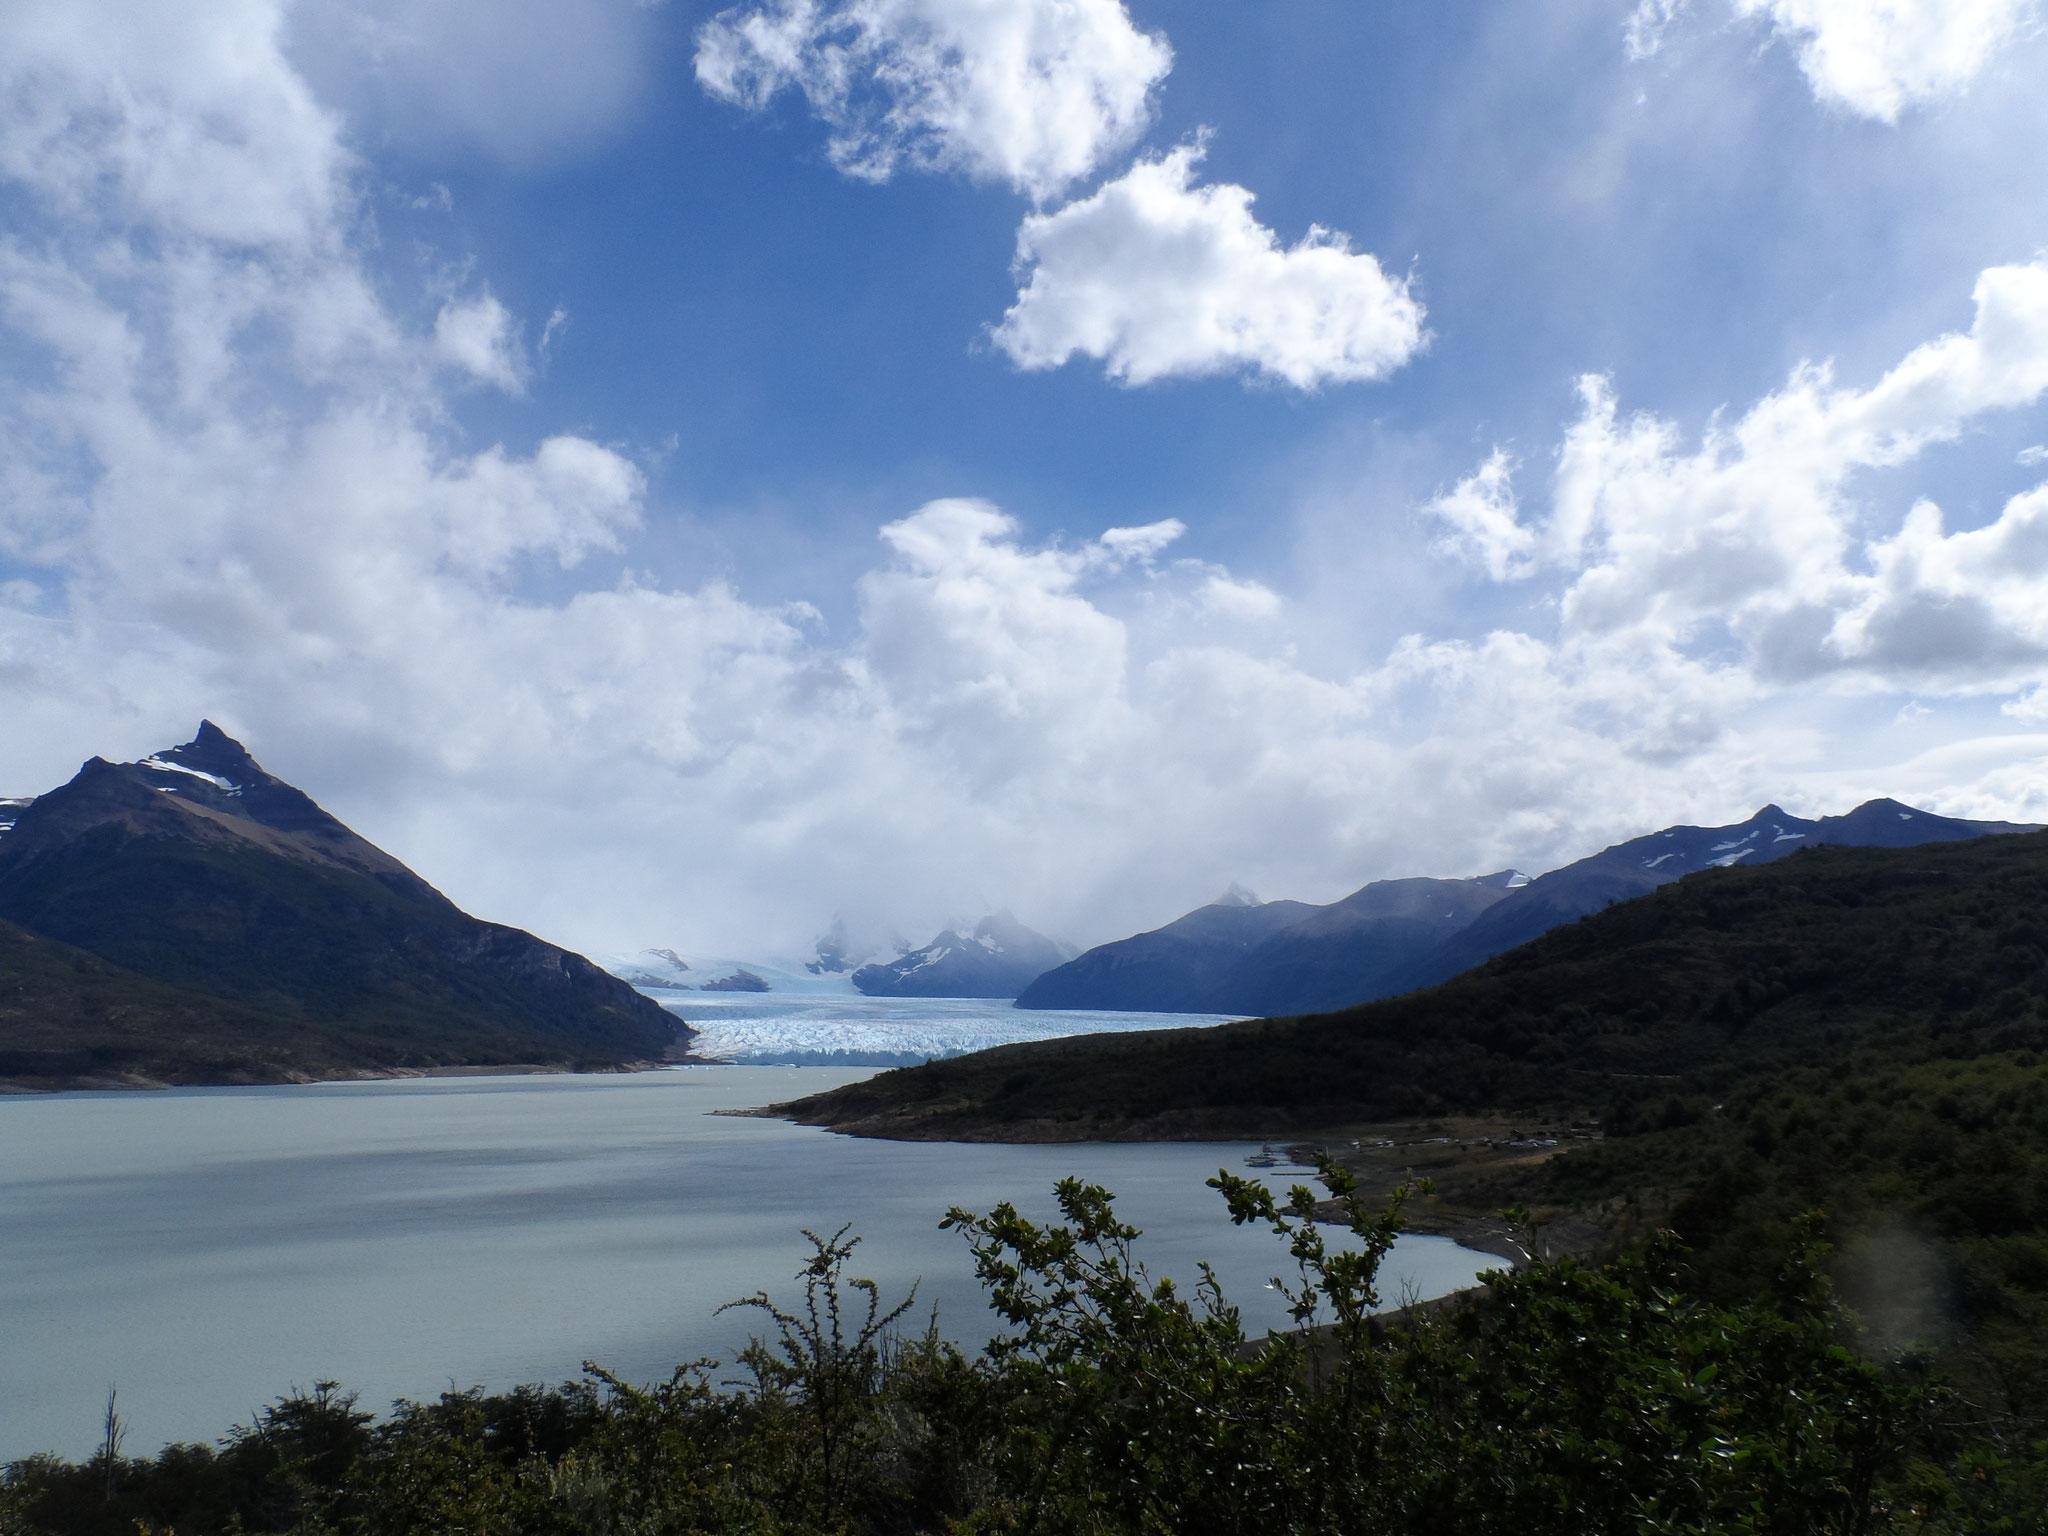 visite du  glacier dit Perito Moreno